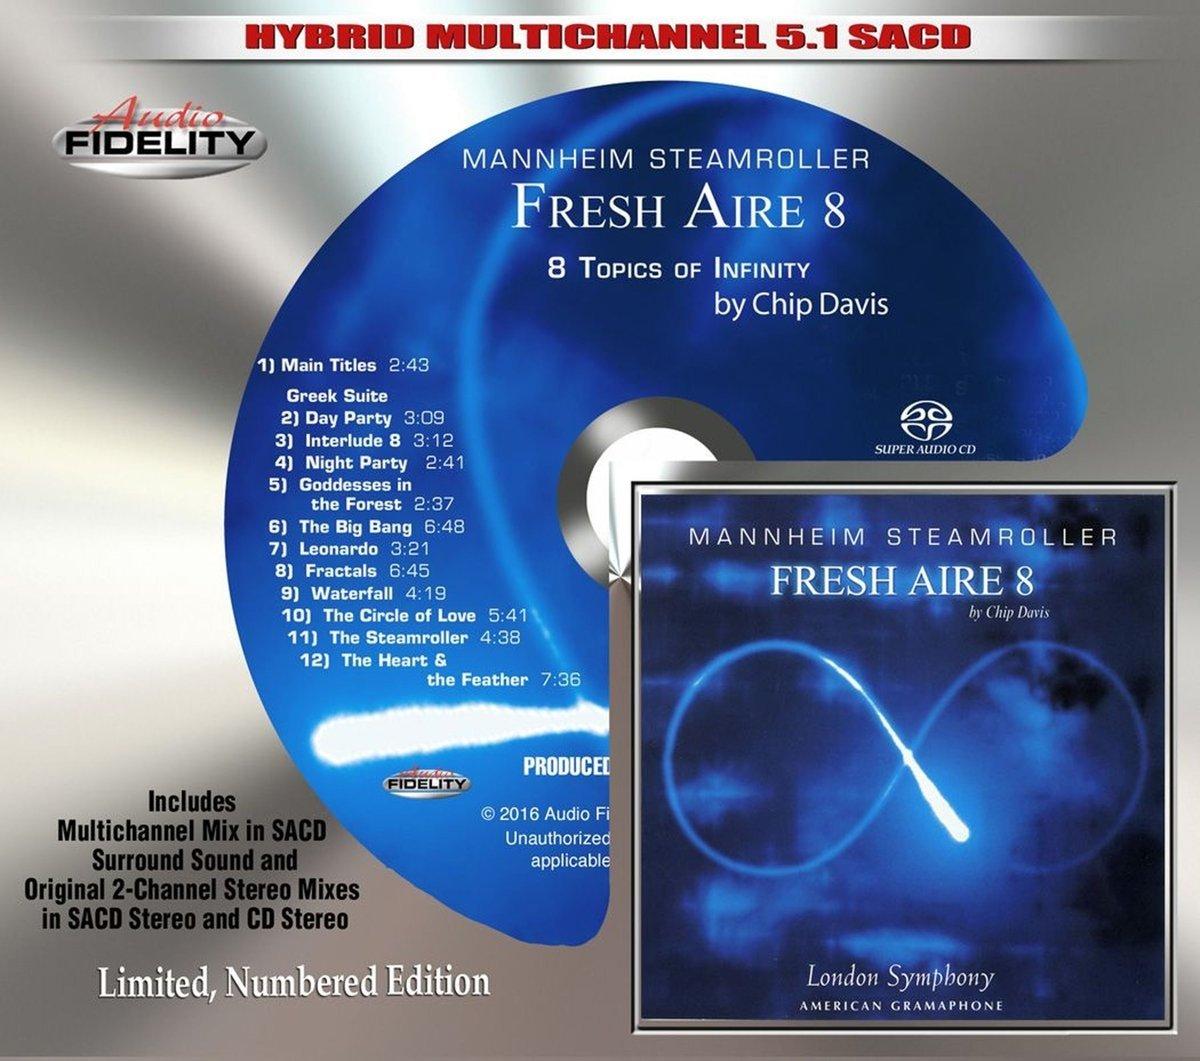 London Symphony Mannheim Steamroller by Chip Davis - Fresh Aire 8 ...